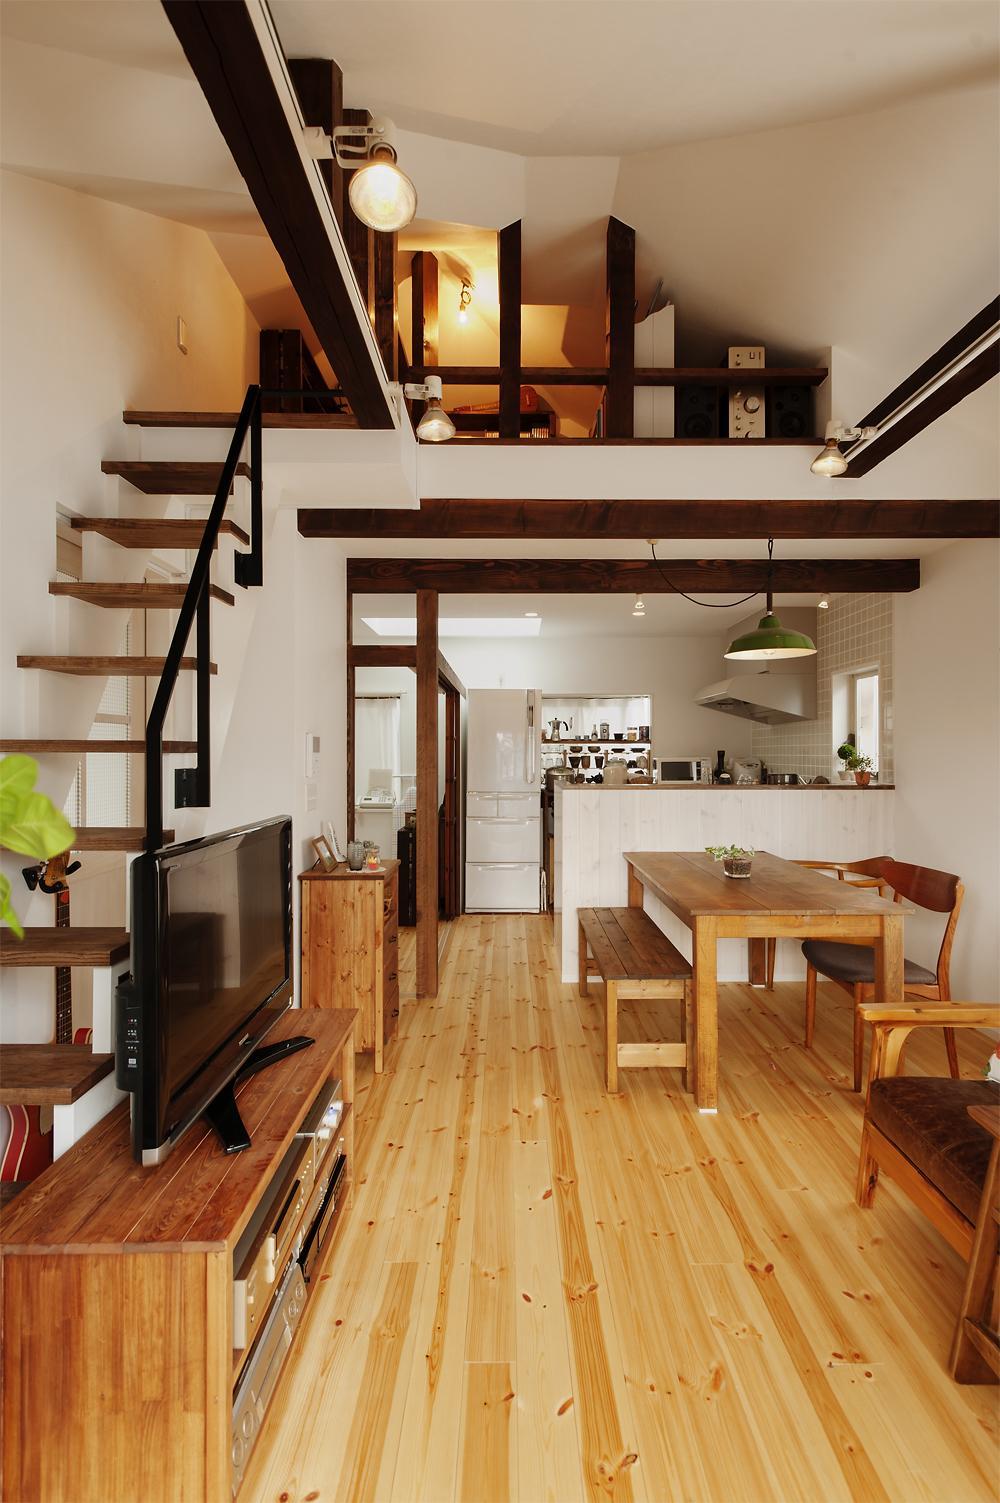 T邸・家族のくらしをより楽しく豊かにするとっておきの家の写真 ロフト付きの開放的なLDK